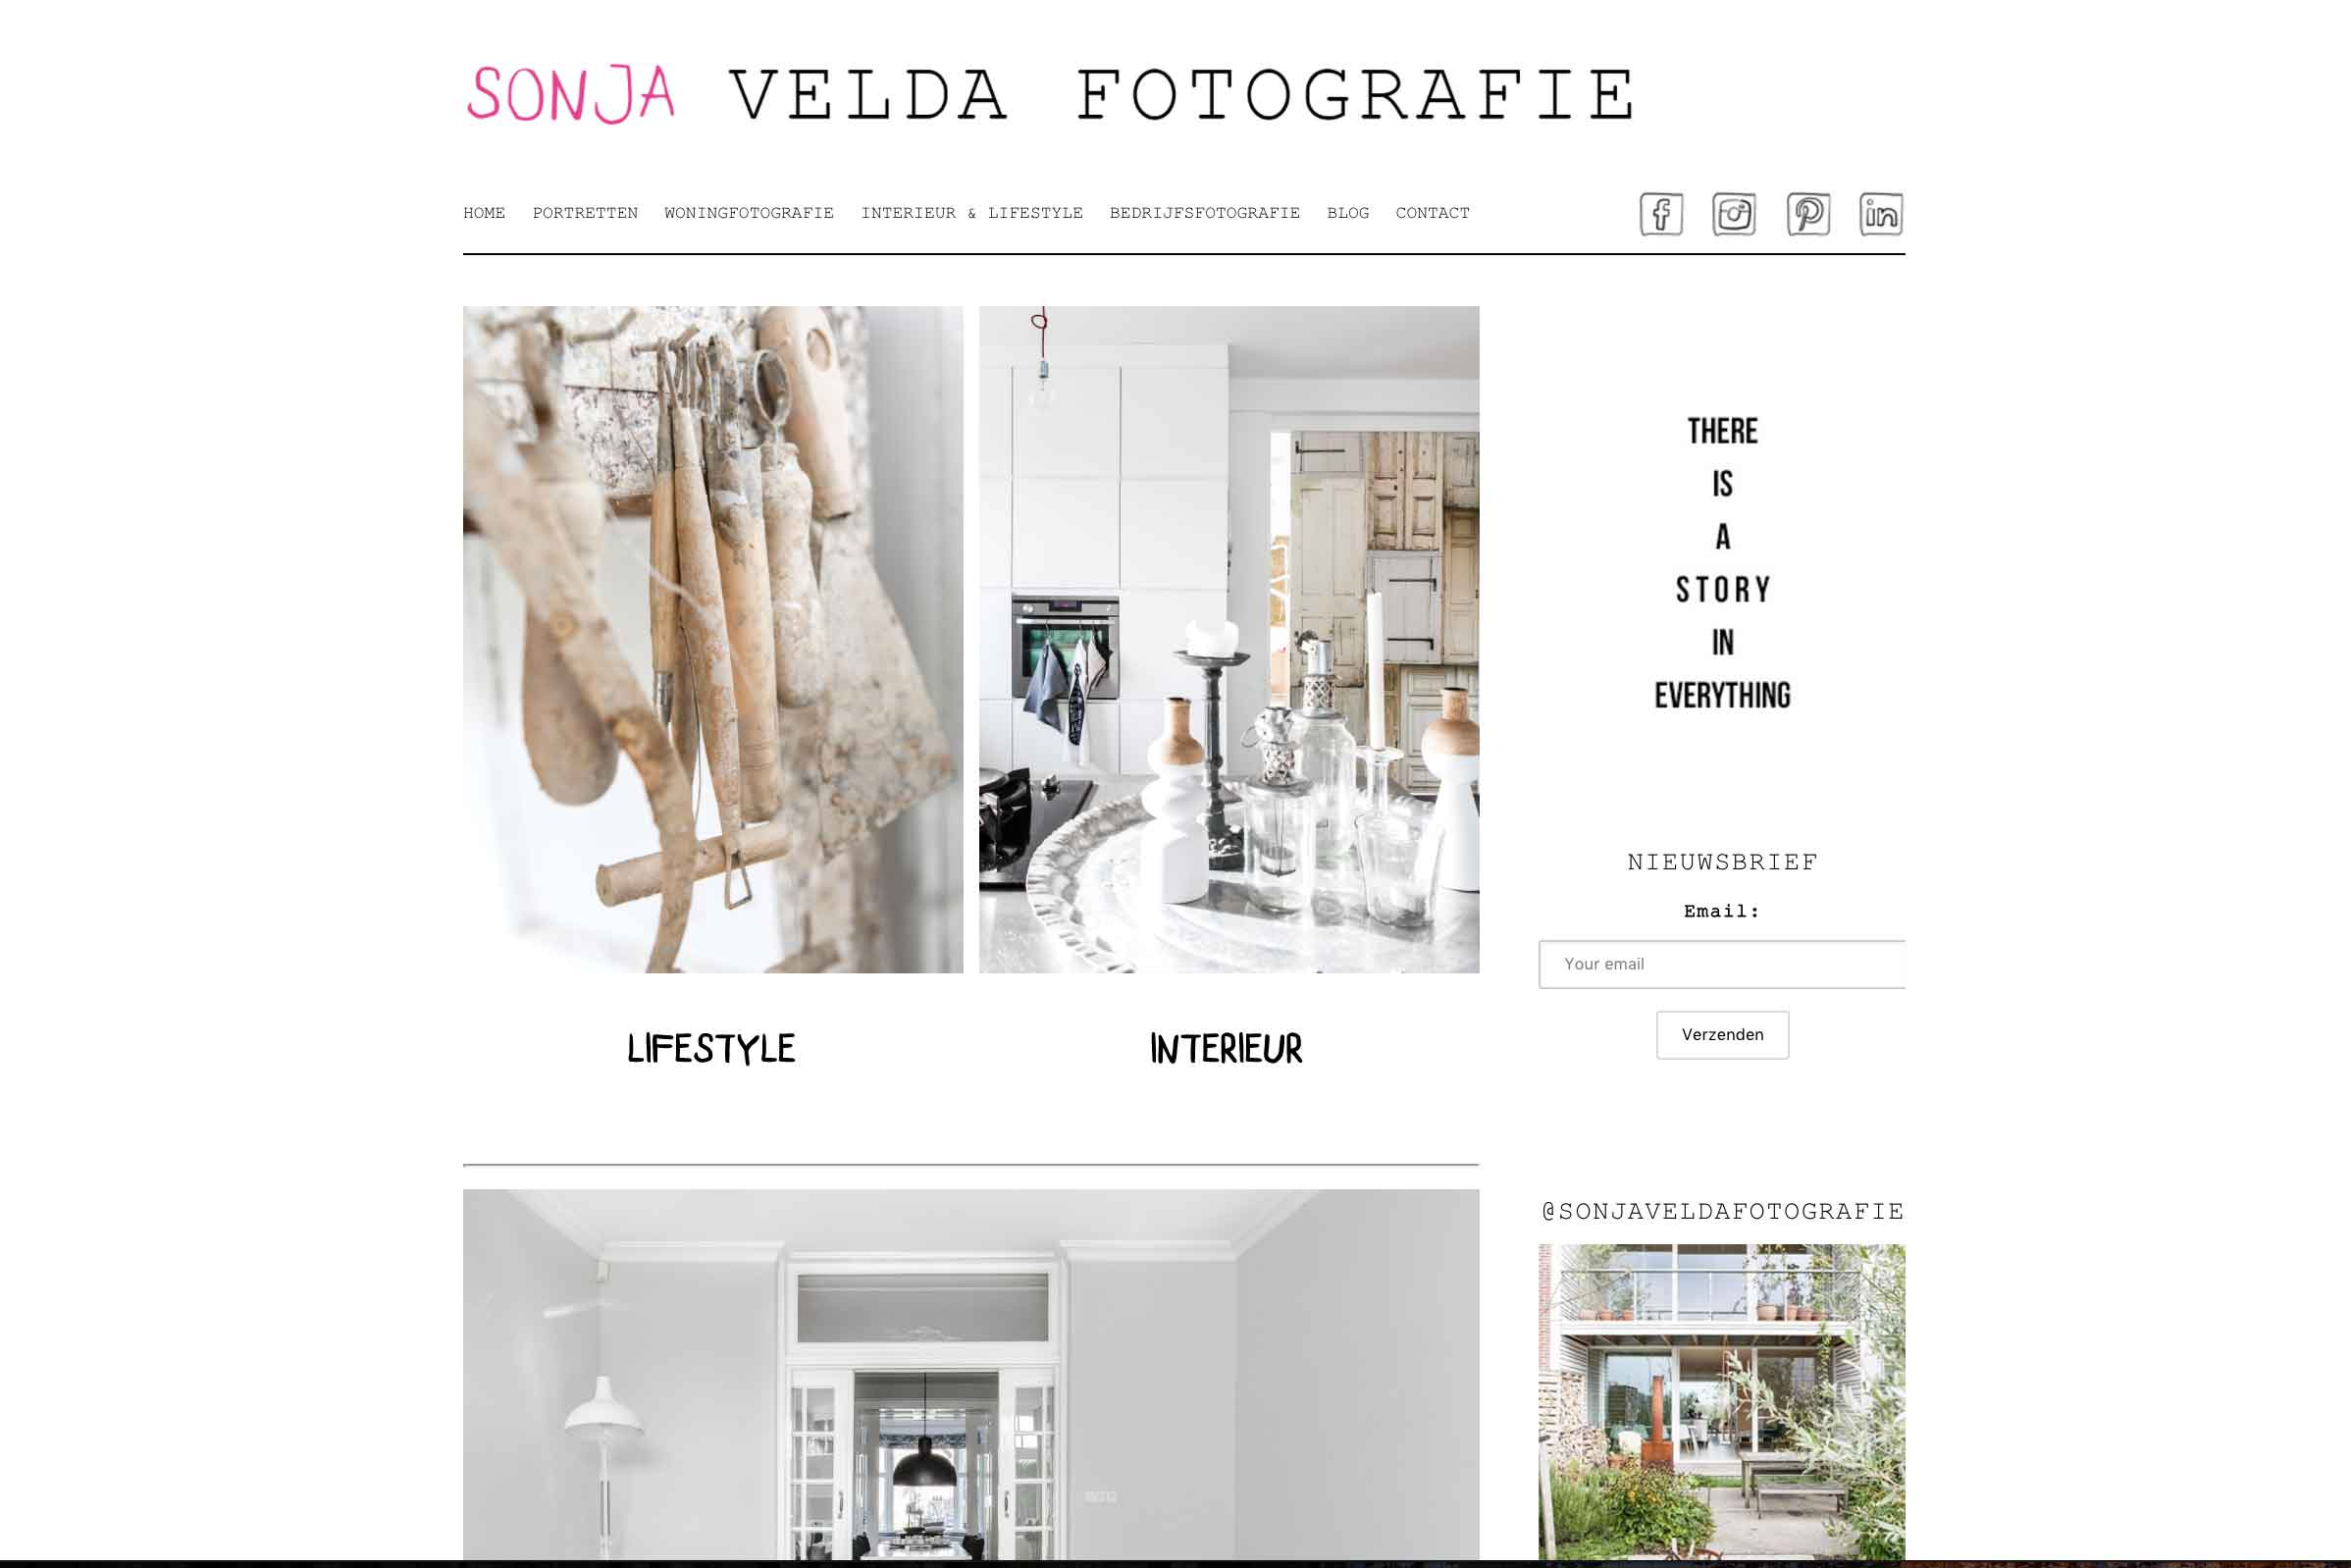 marleenvisser_digital_productions_sonja_velda_fotograffie